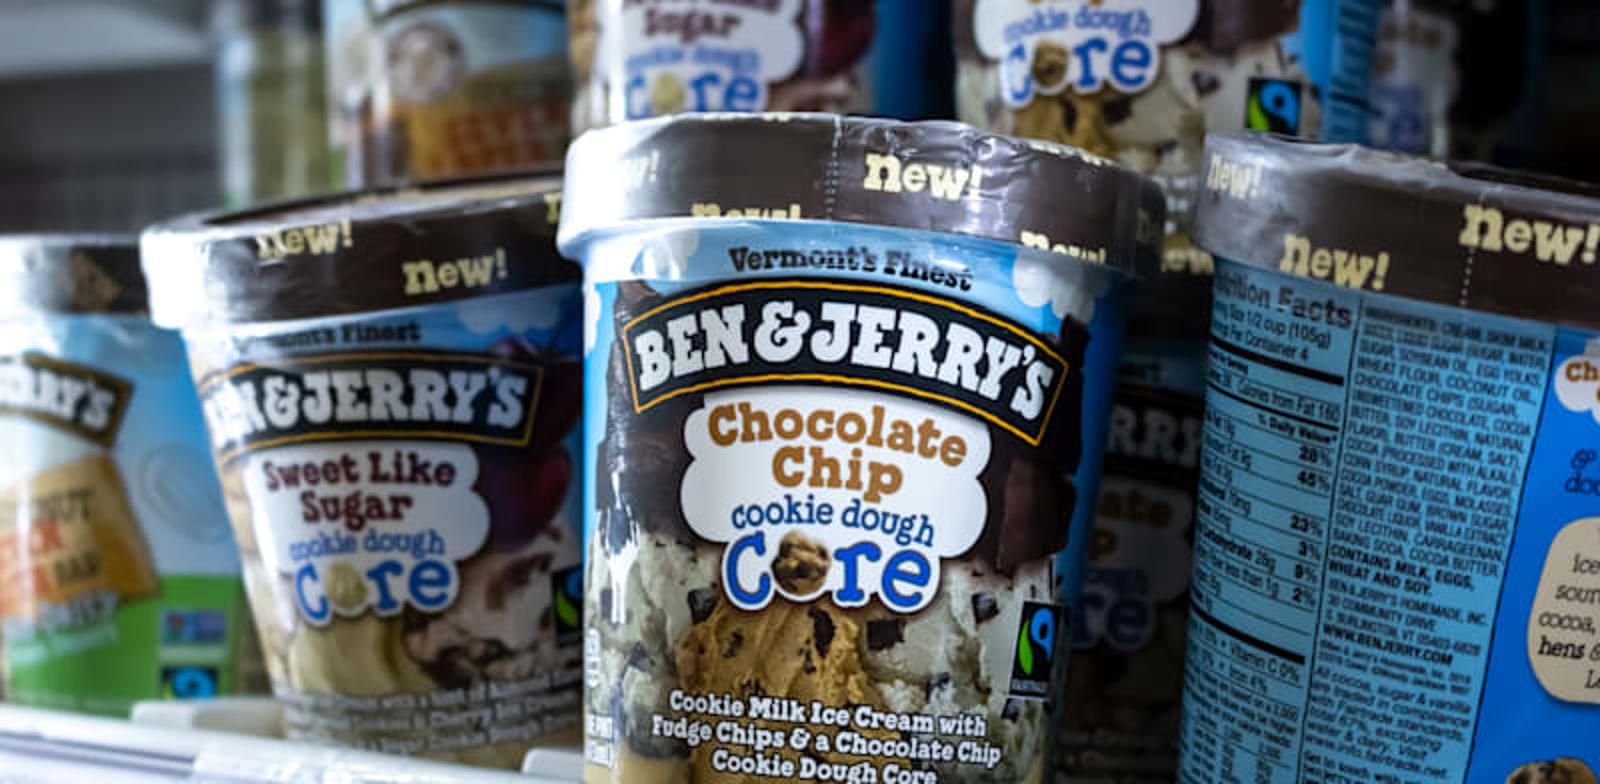 גלידות של בן אנד ג'ריס / צילום: Shutterstock, TonelsonProductions